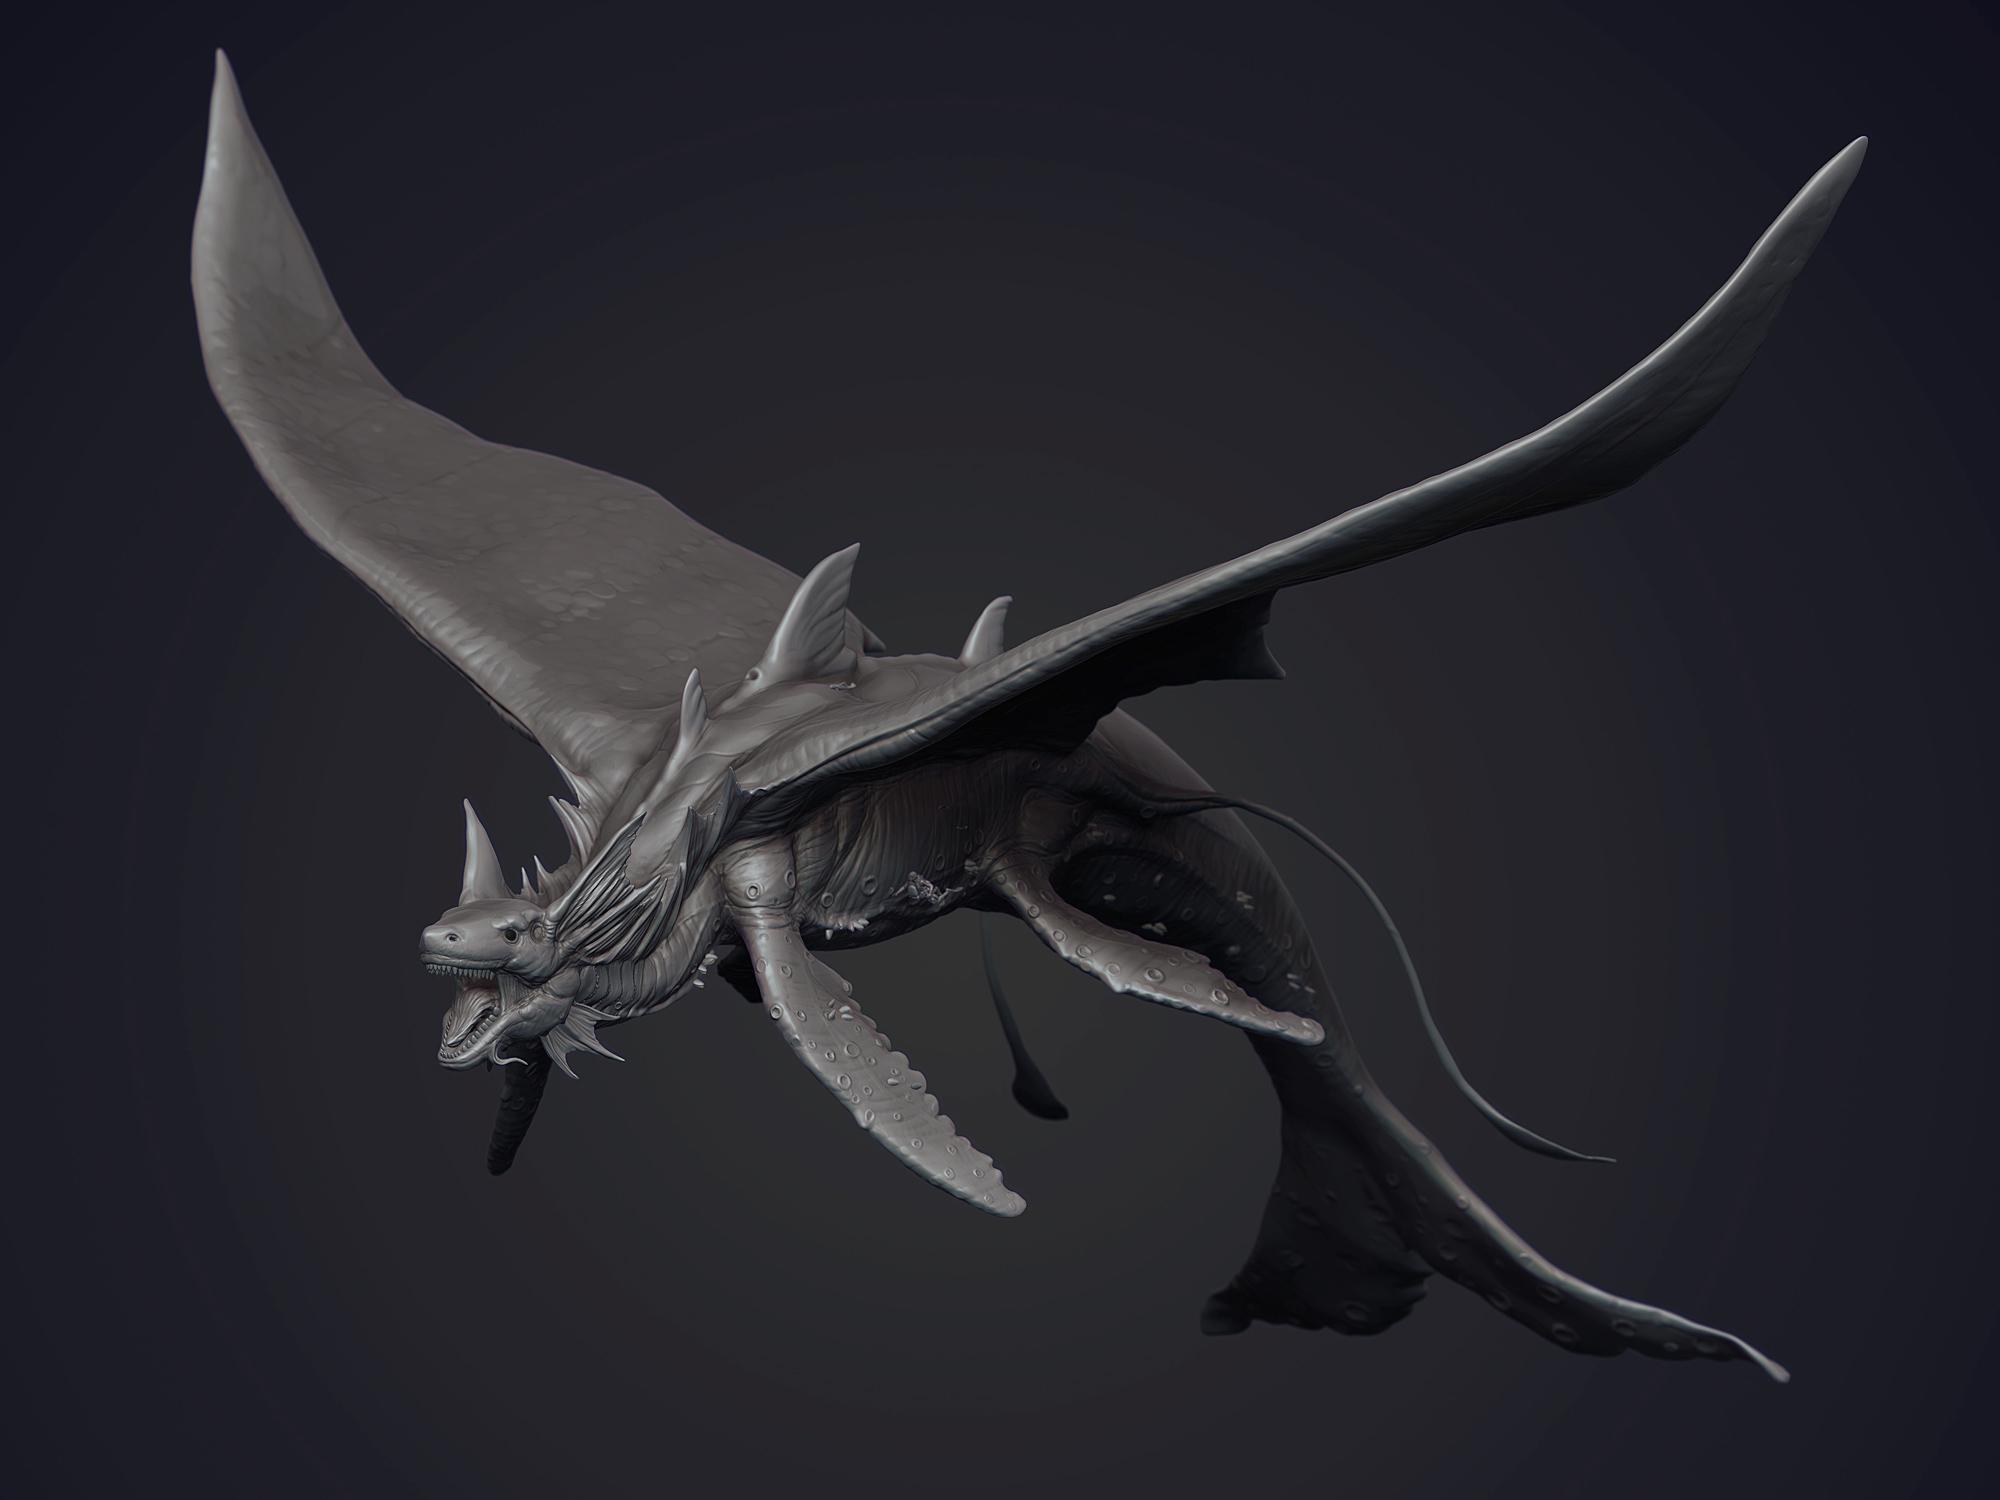 Water dragon by Stranger1988